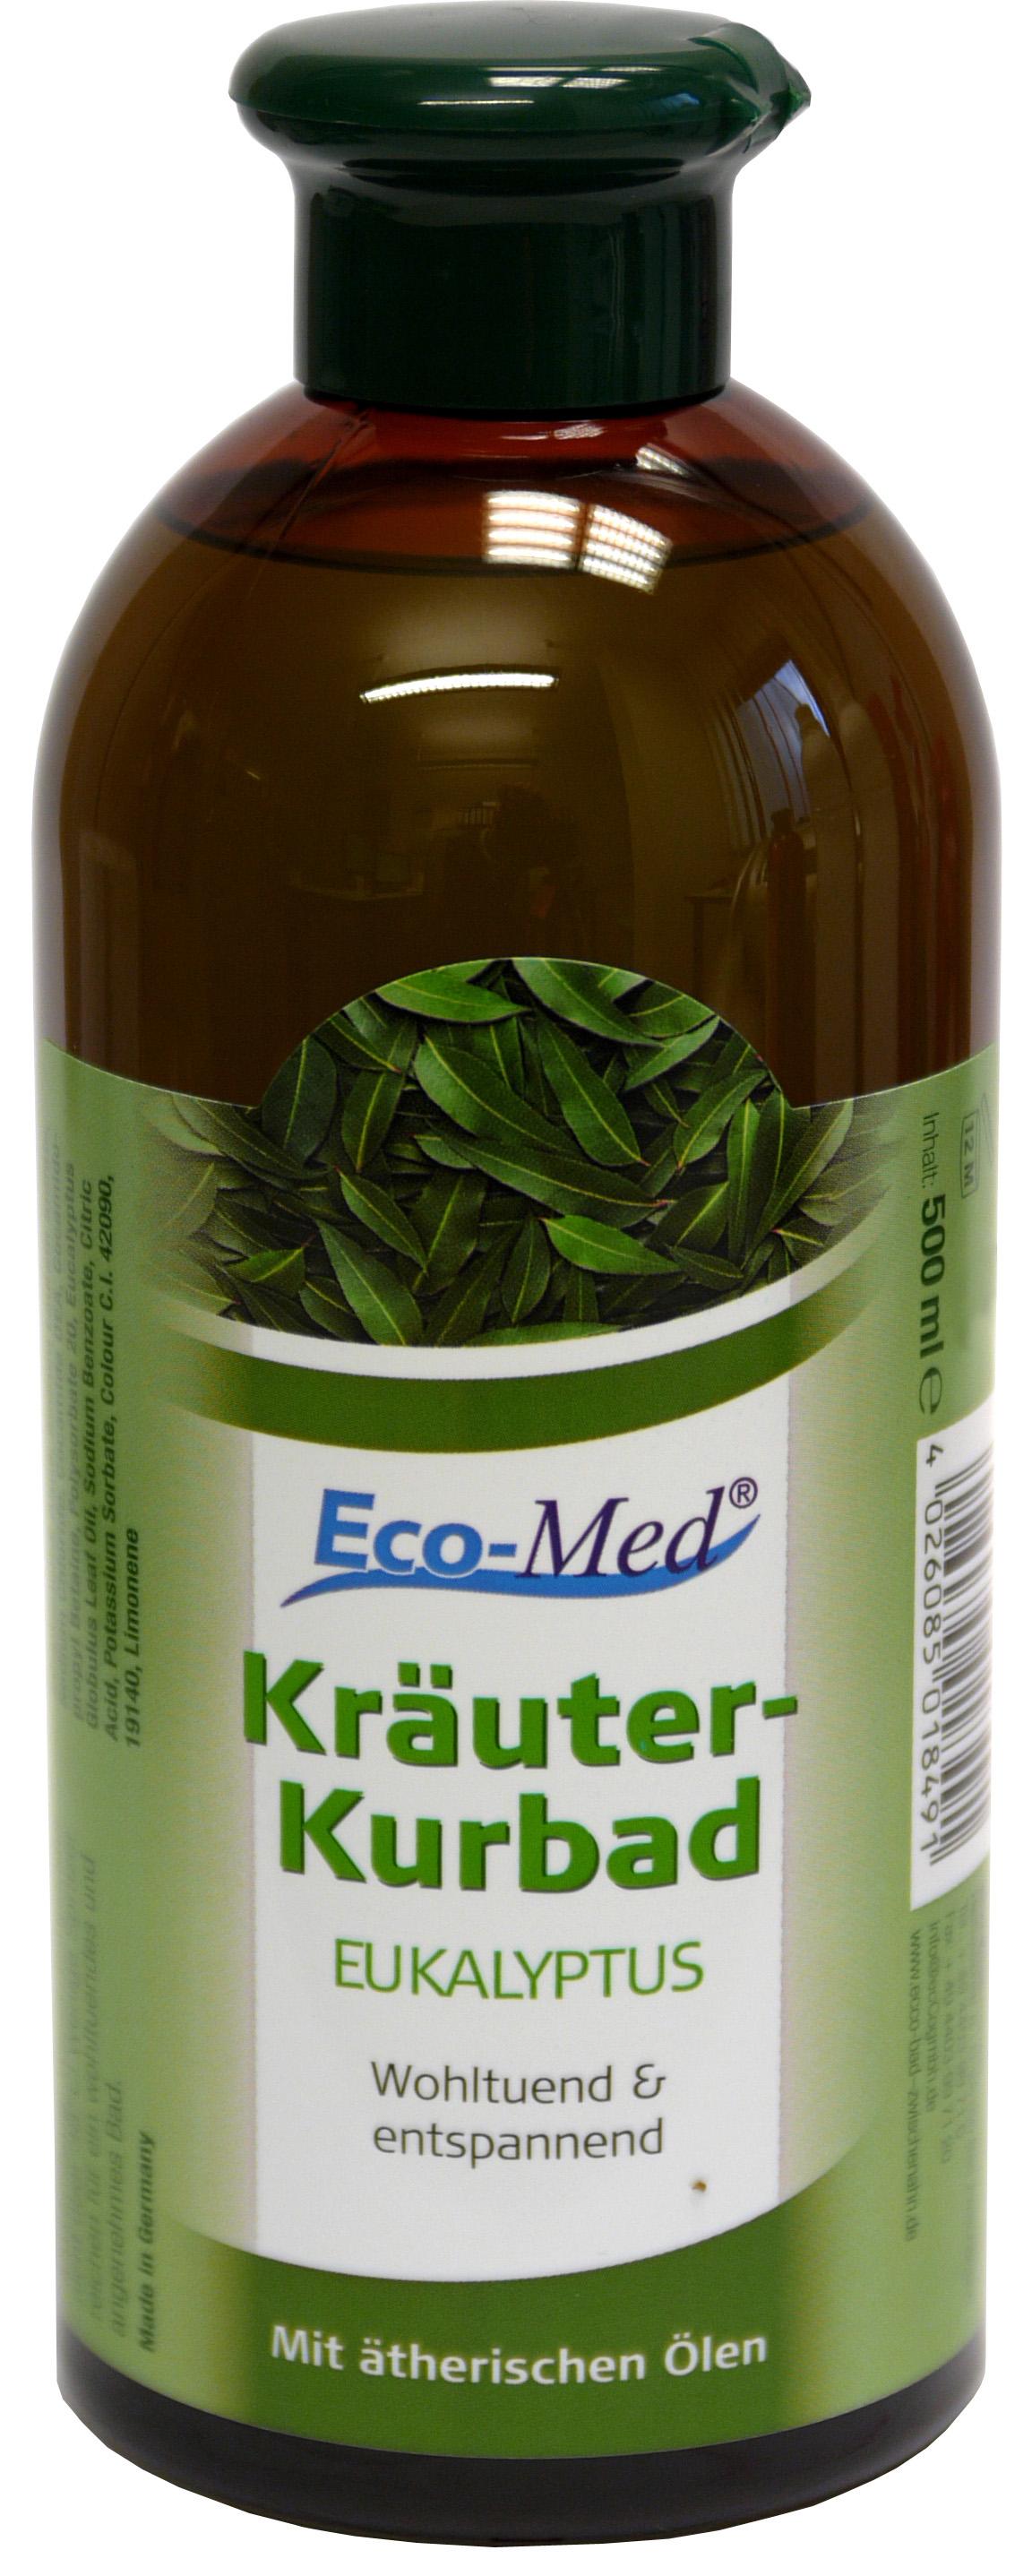 01849 - Eco-Med Kräuterkurbad 500 ml Eukalyptus